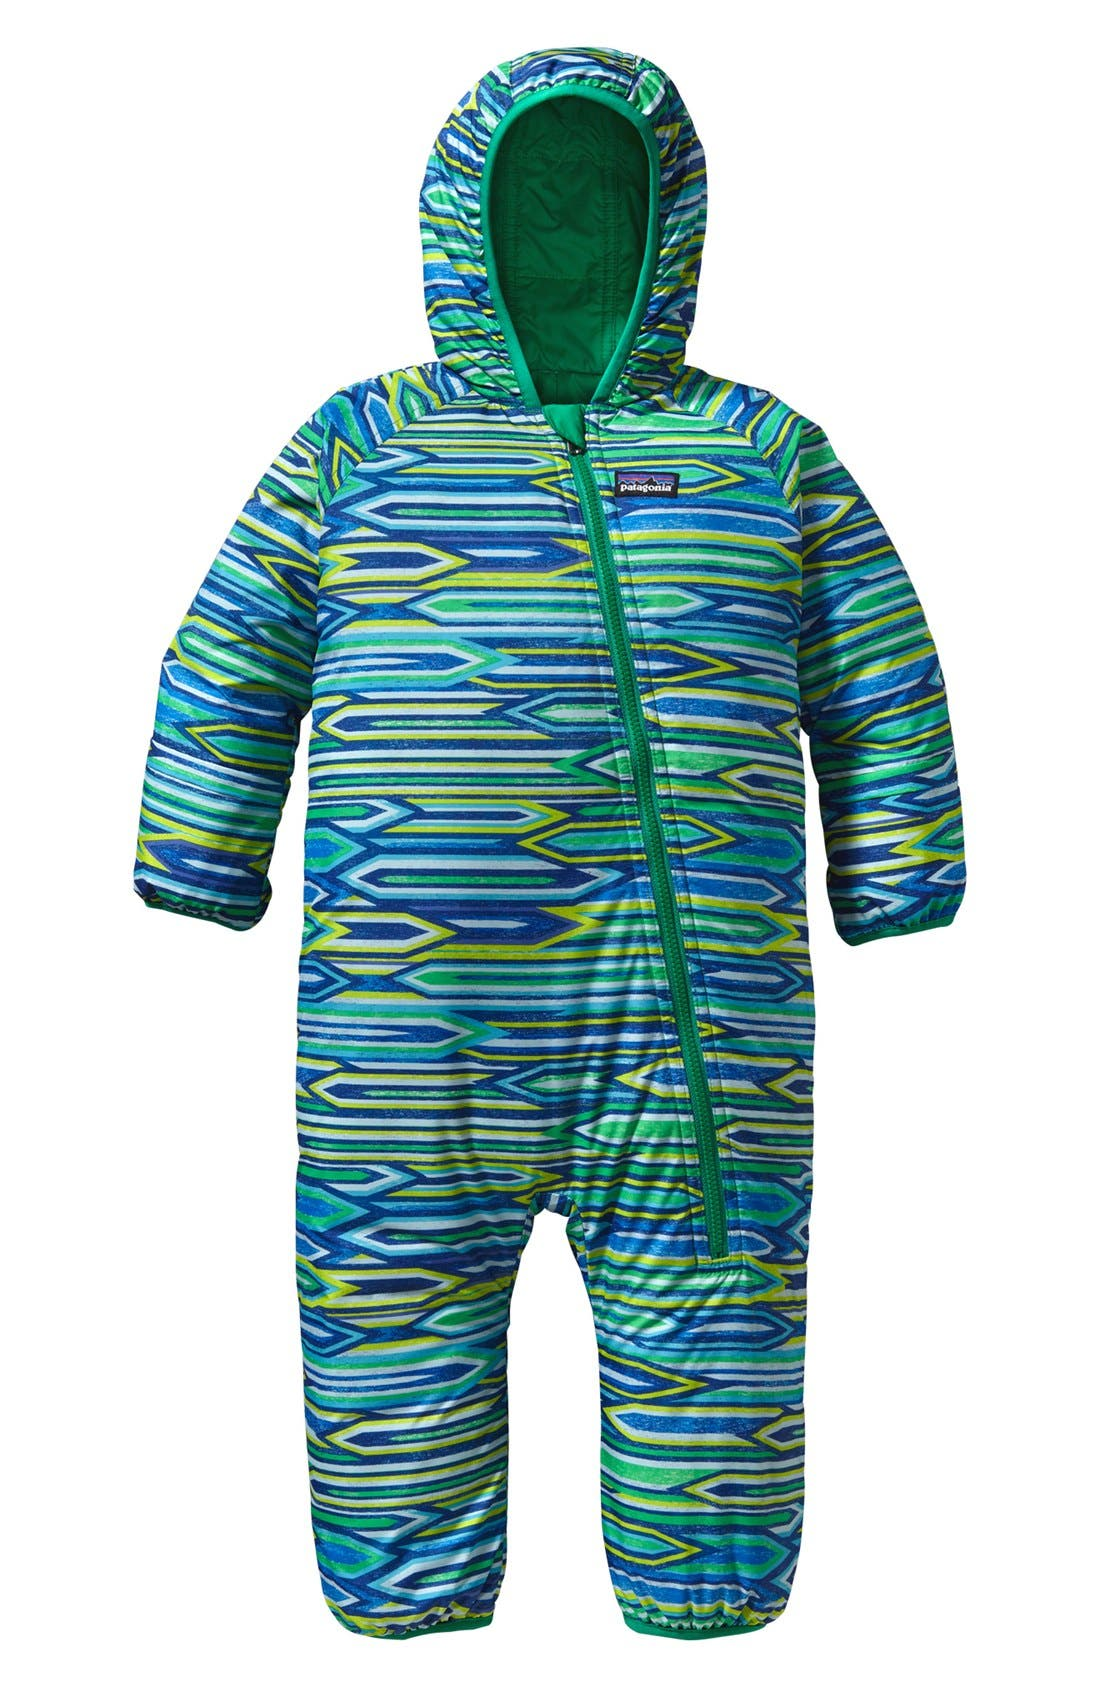 Alternate Image 1 Selected - Patagonia Reversible Bunting (Infant)